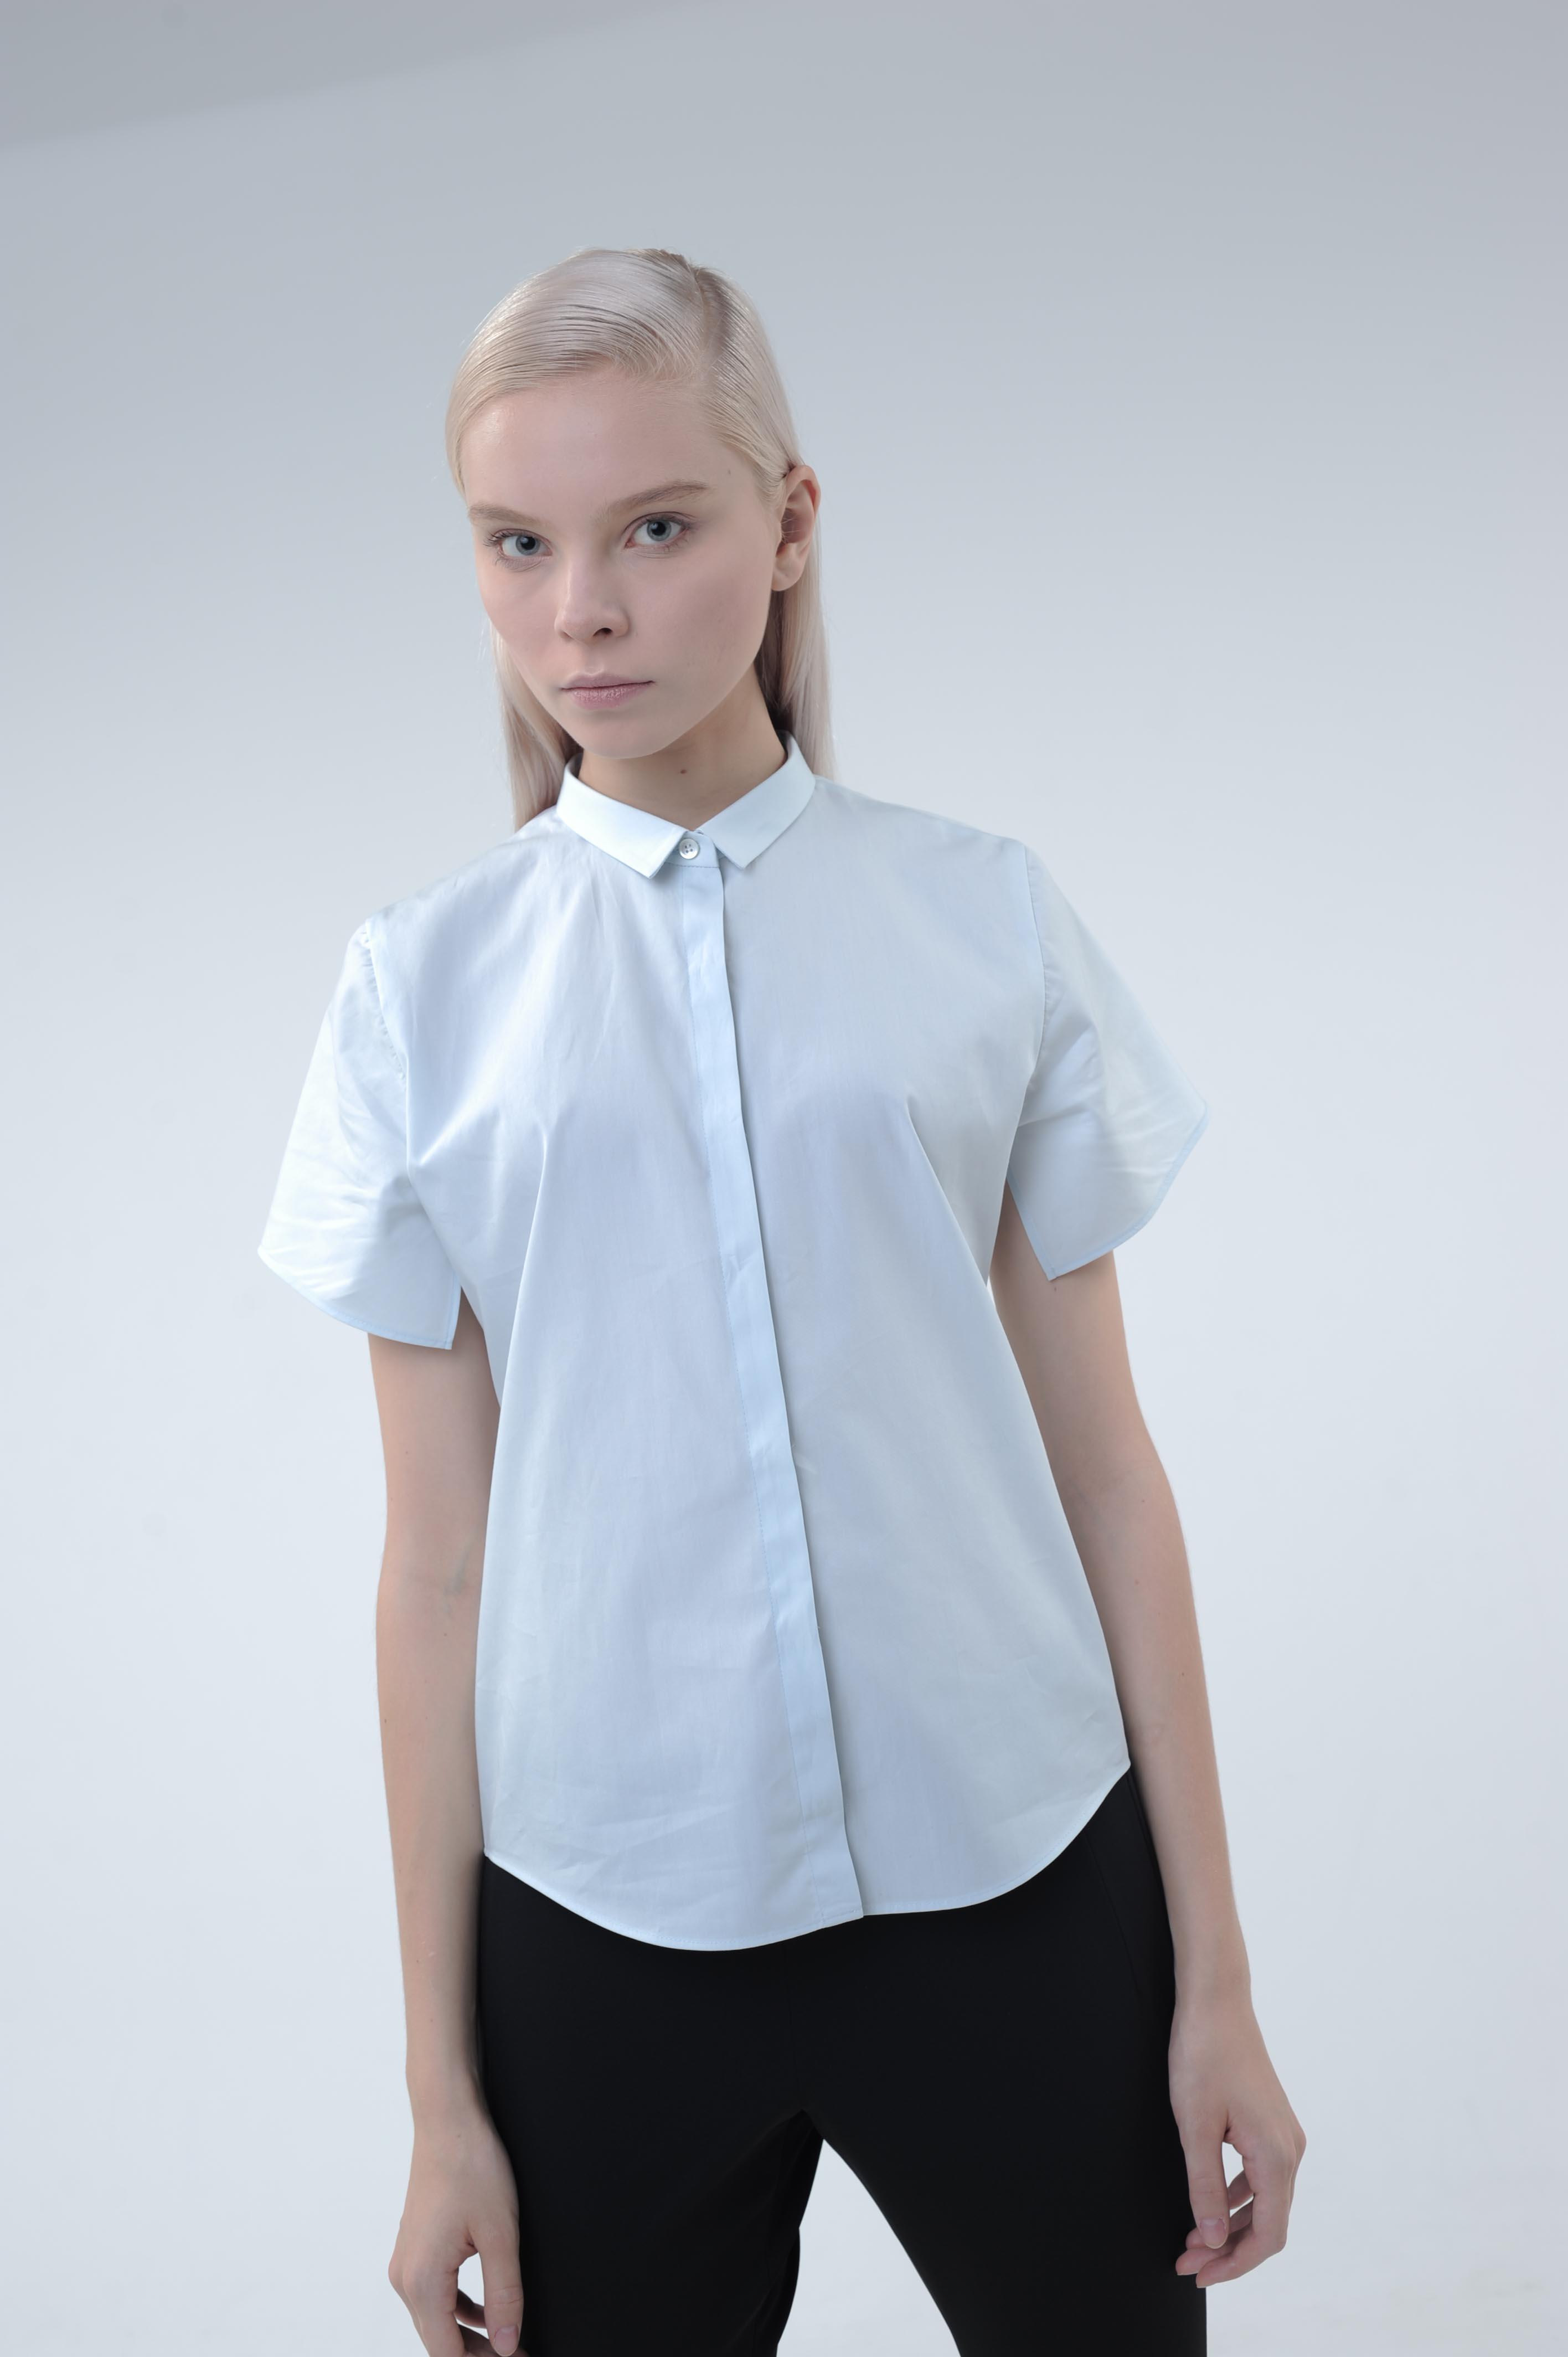 uemulo munenoli ホワイトレーベルのシャツ・ブラウス 『BELL』_e0122680_1825281.jpg